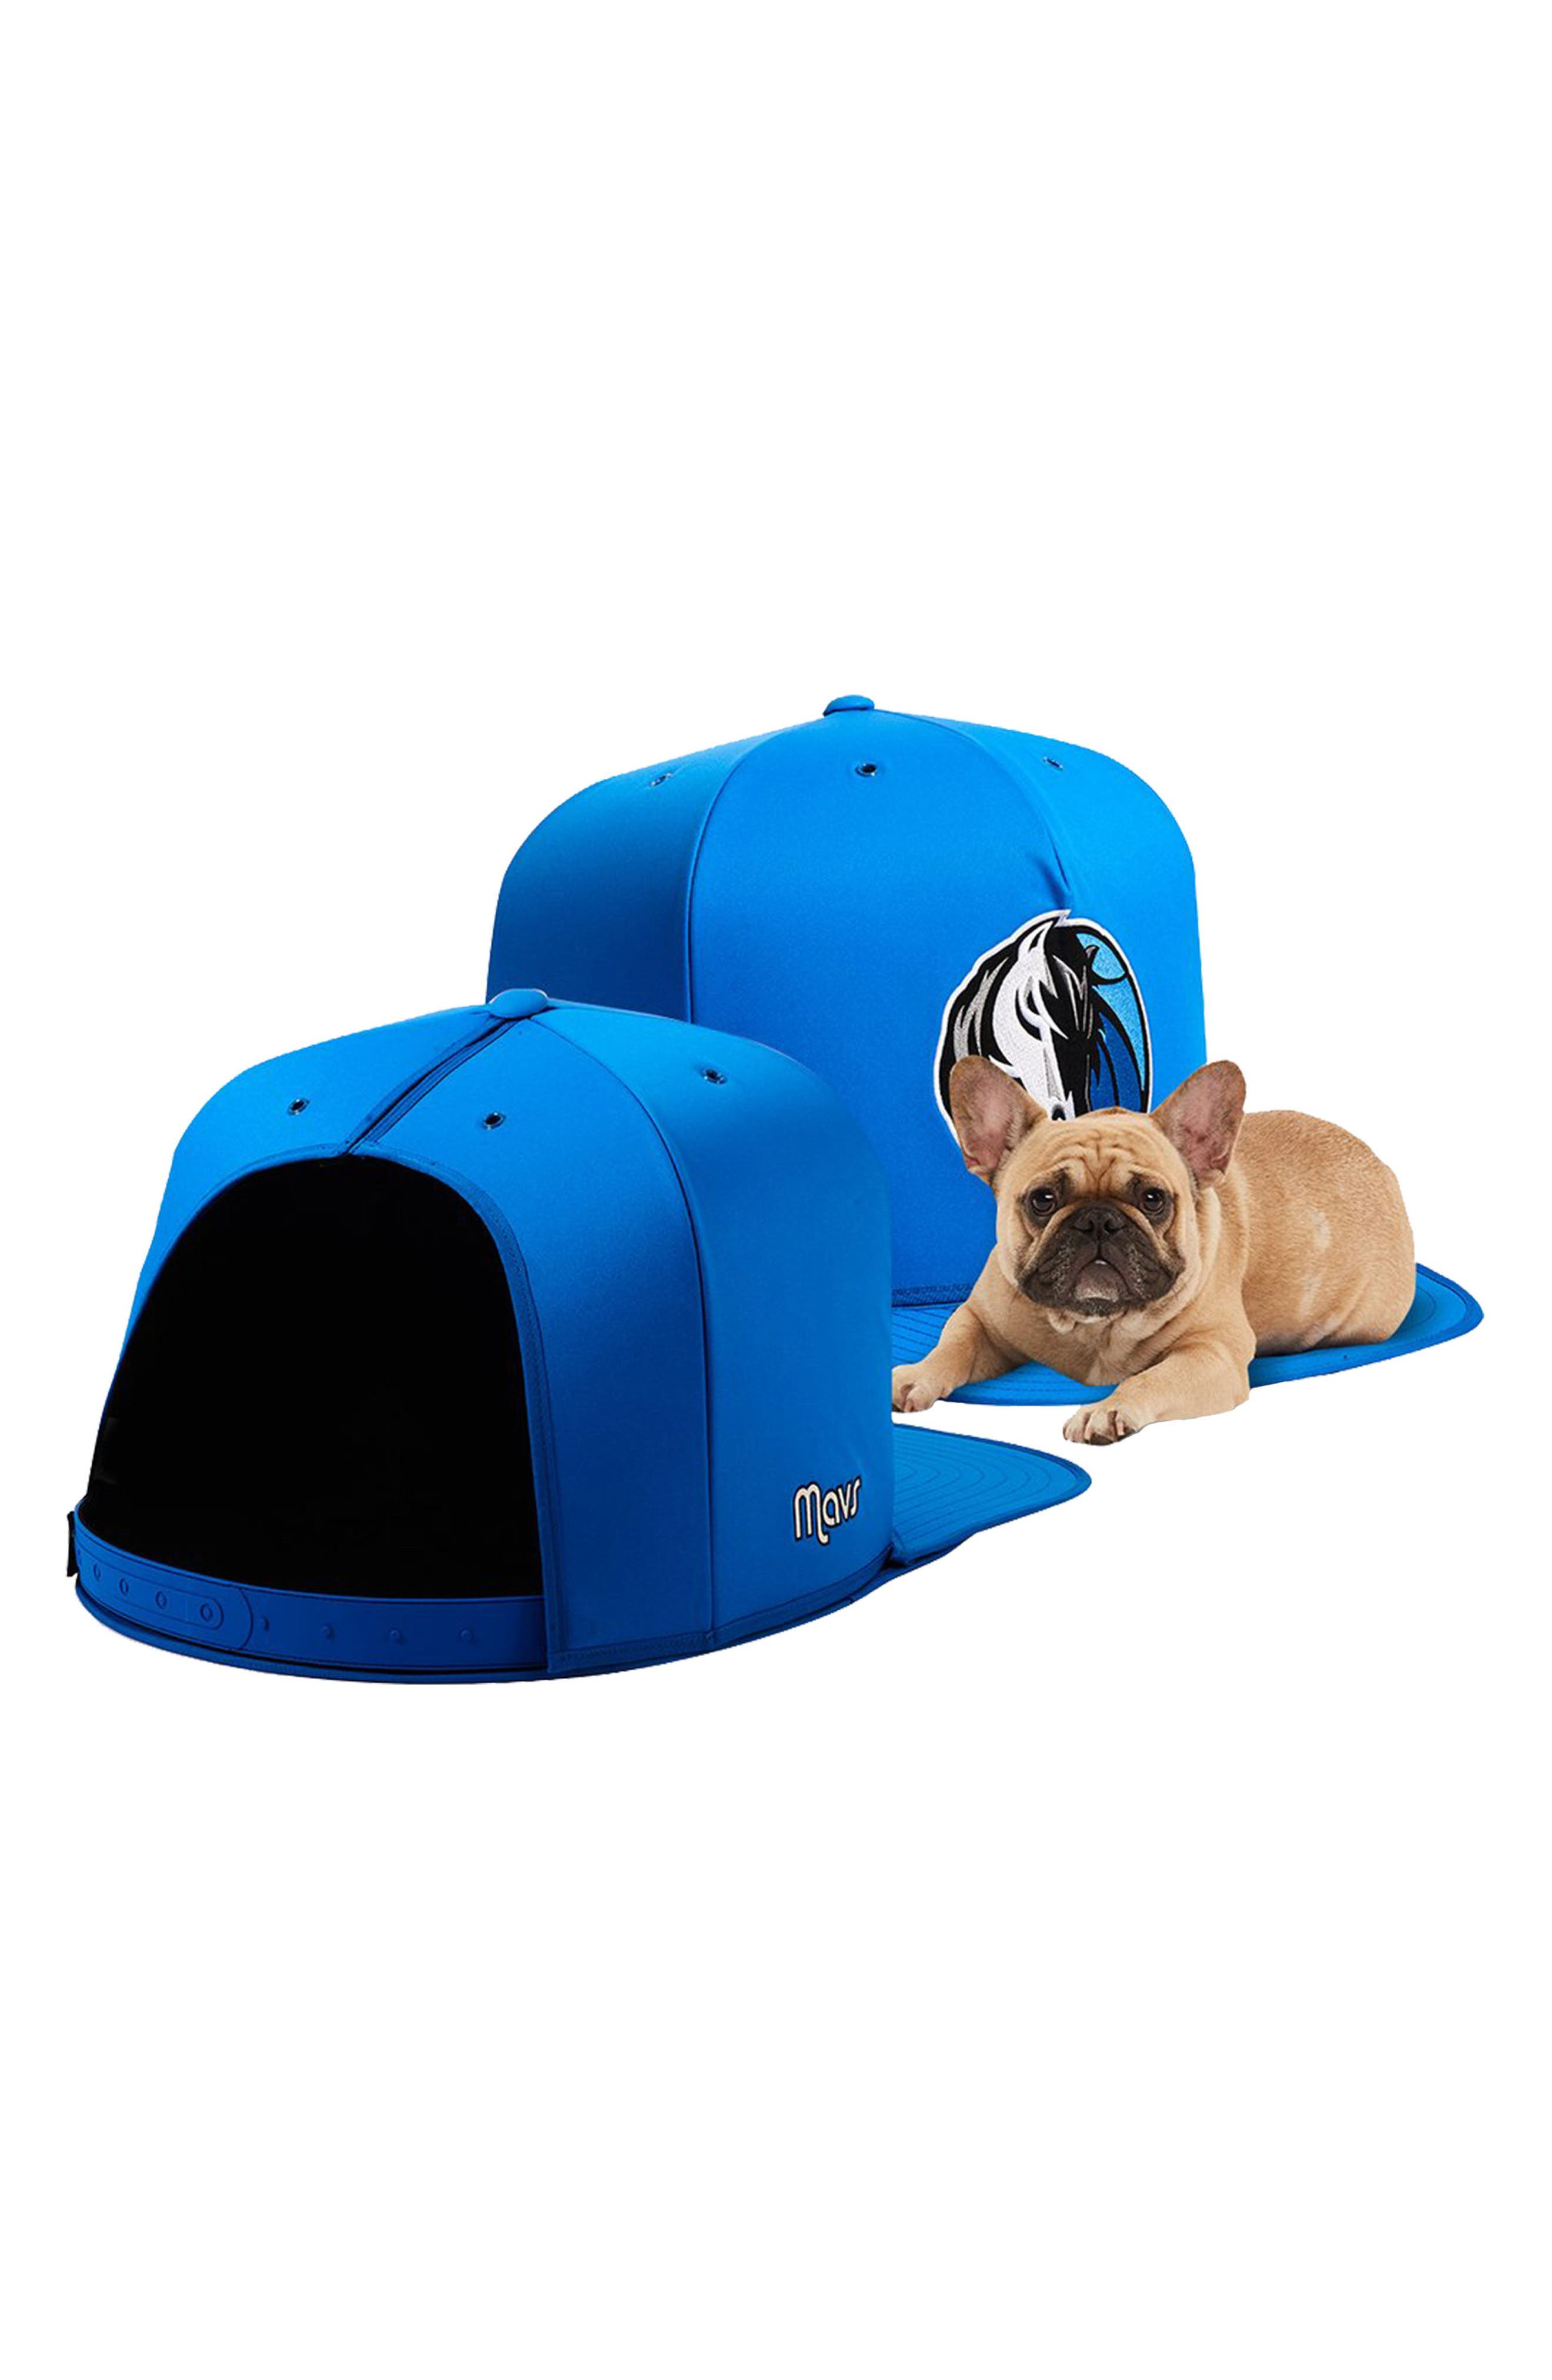 Dallas Mavericks Pet Bed,                             Alternate thumbnail 2, color,                             Blue